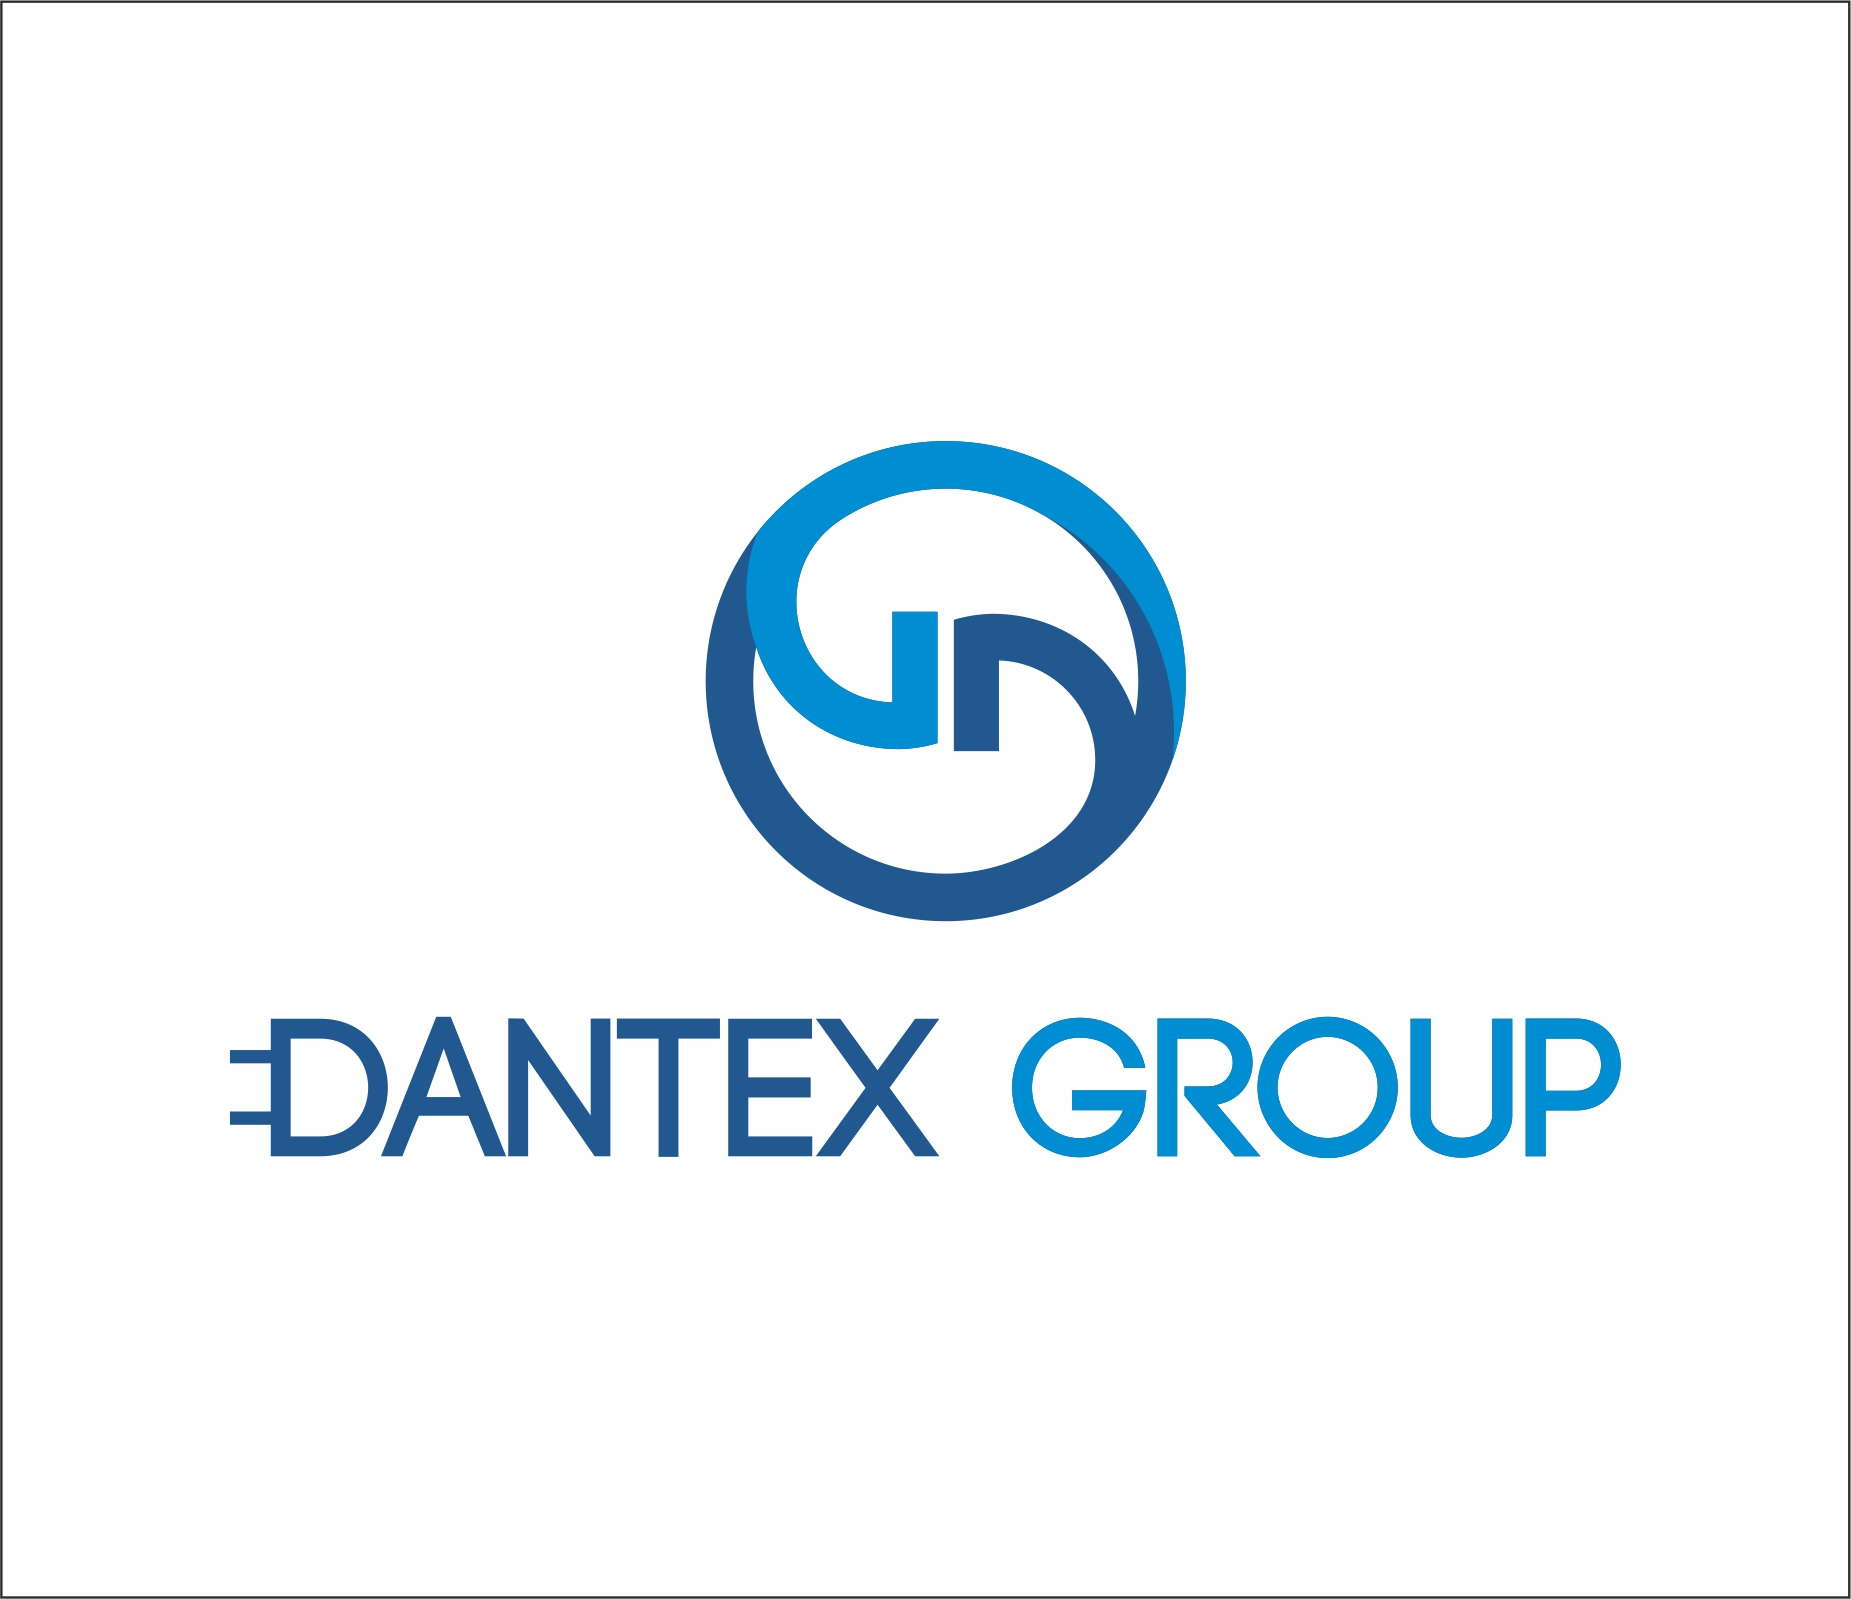 Конкурс на разработку логотипа для компании Dantex Group  фото f_4065c00f7a90c3a3.jpg